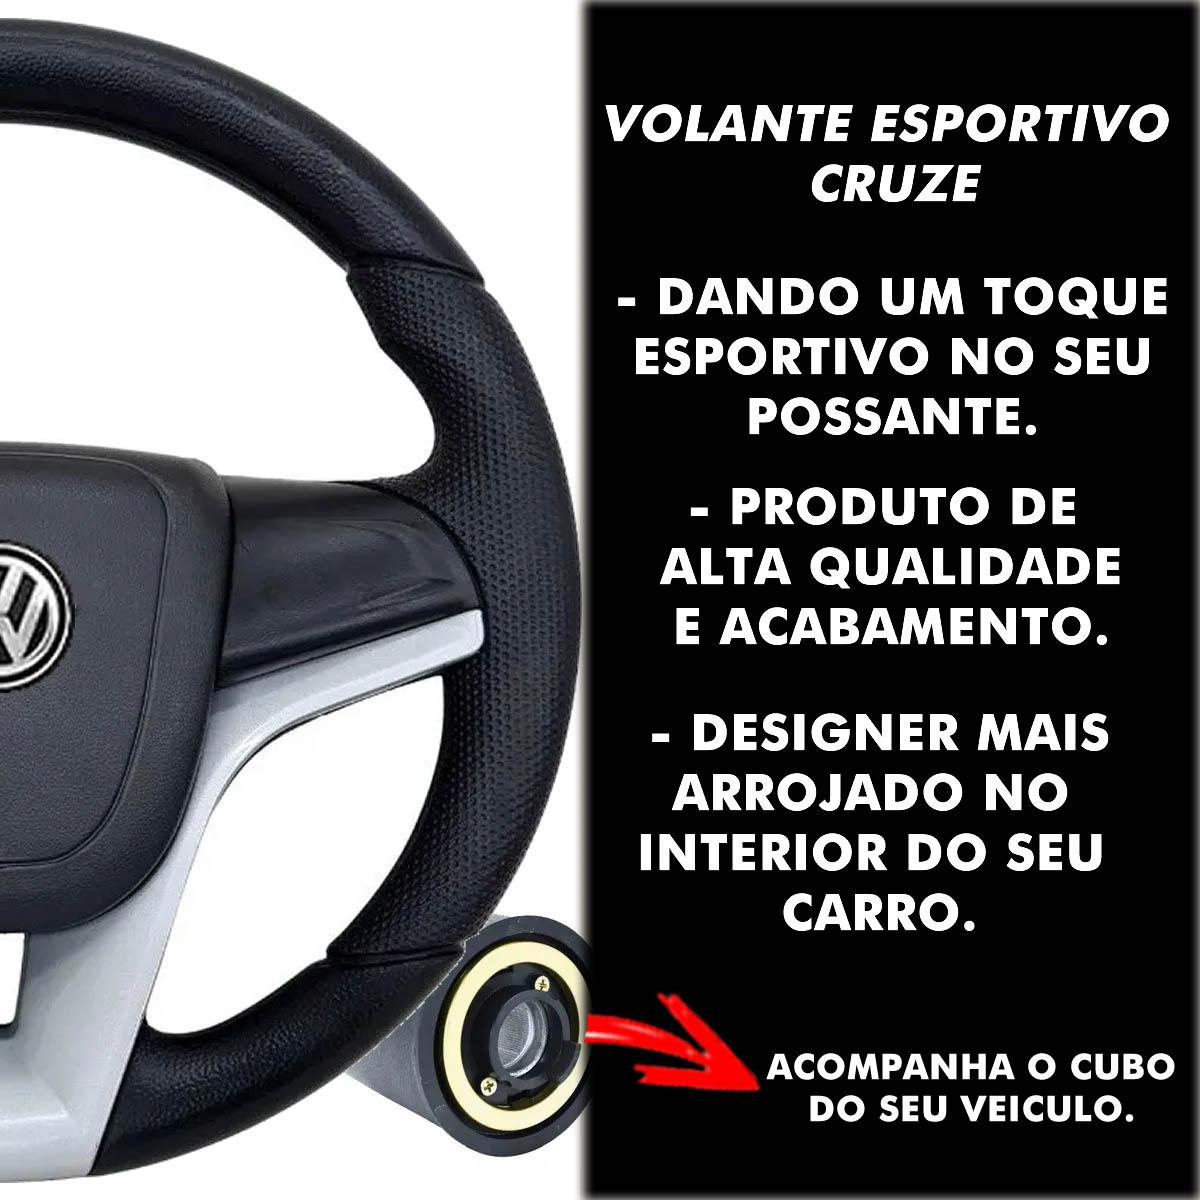 Volante Volkswagen de Cruze Esportivo Cubo Golf Parati Saveiro Polo Fox Passat Bora Fusca Kombi Poliparts